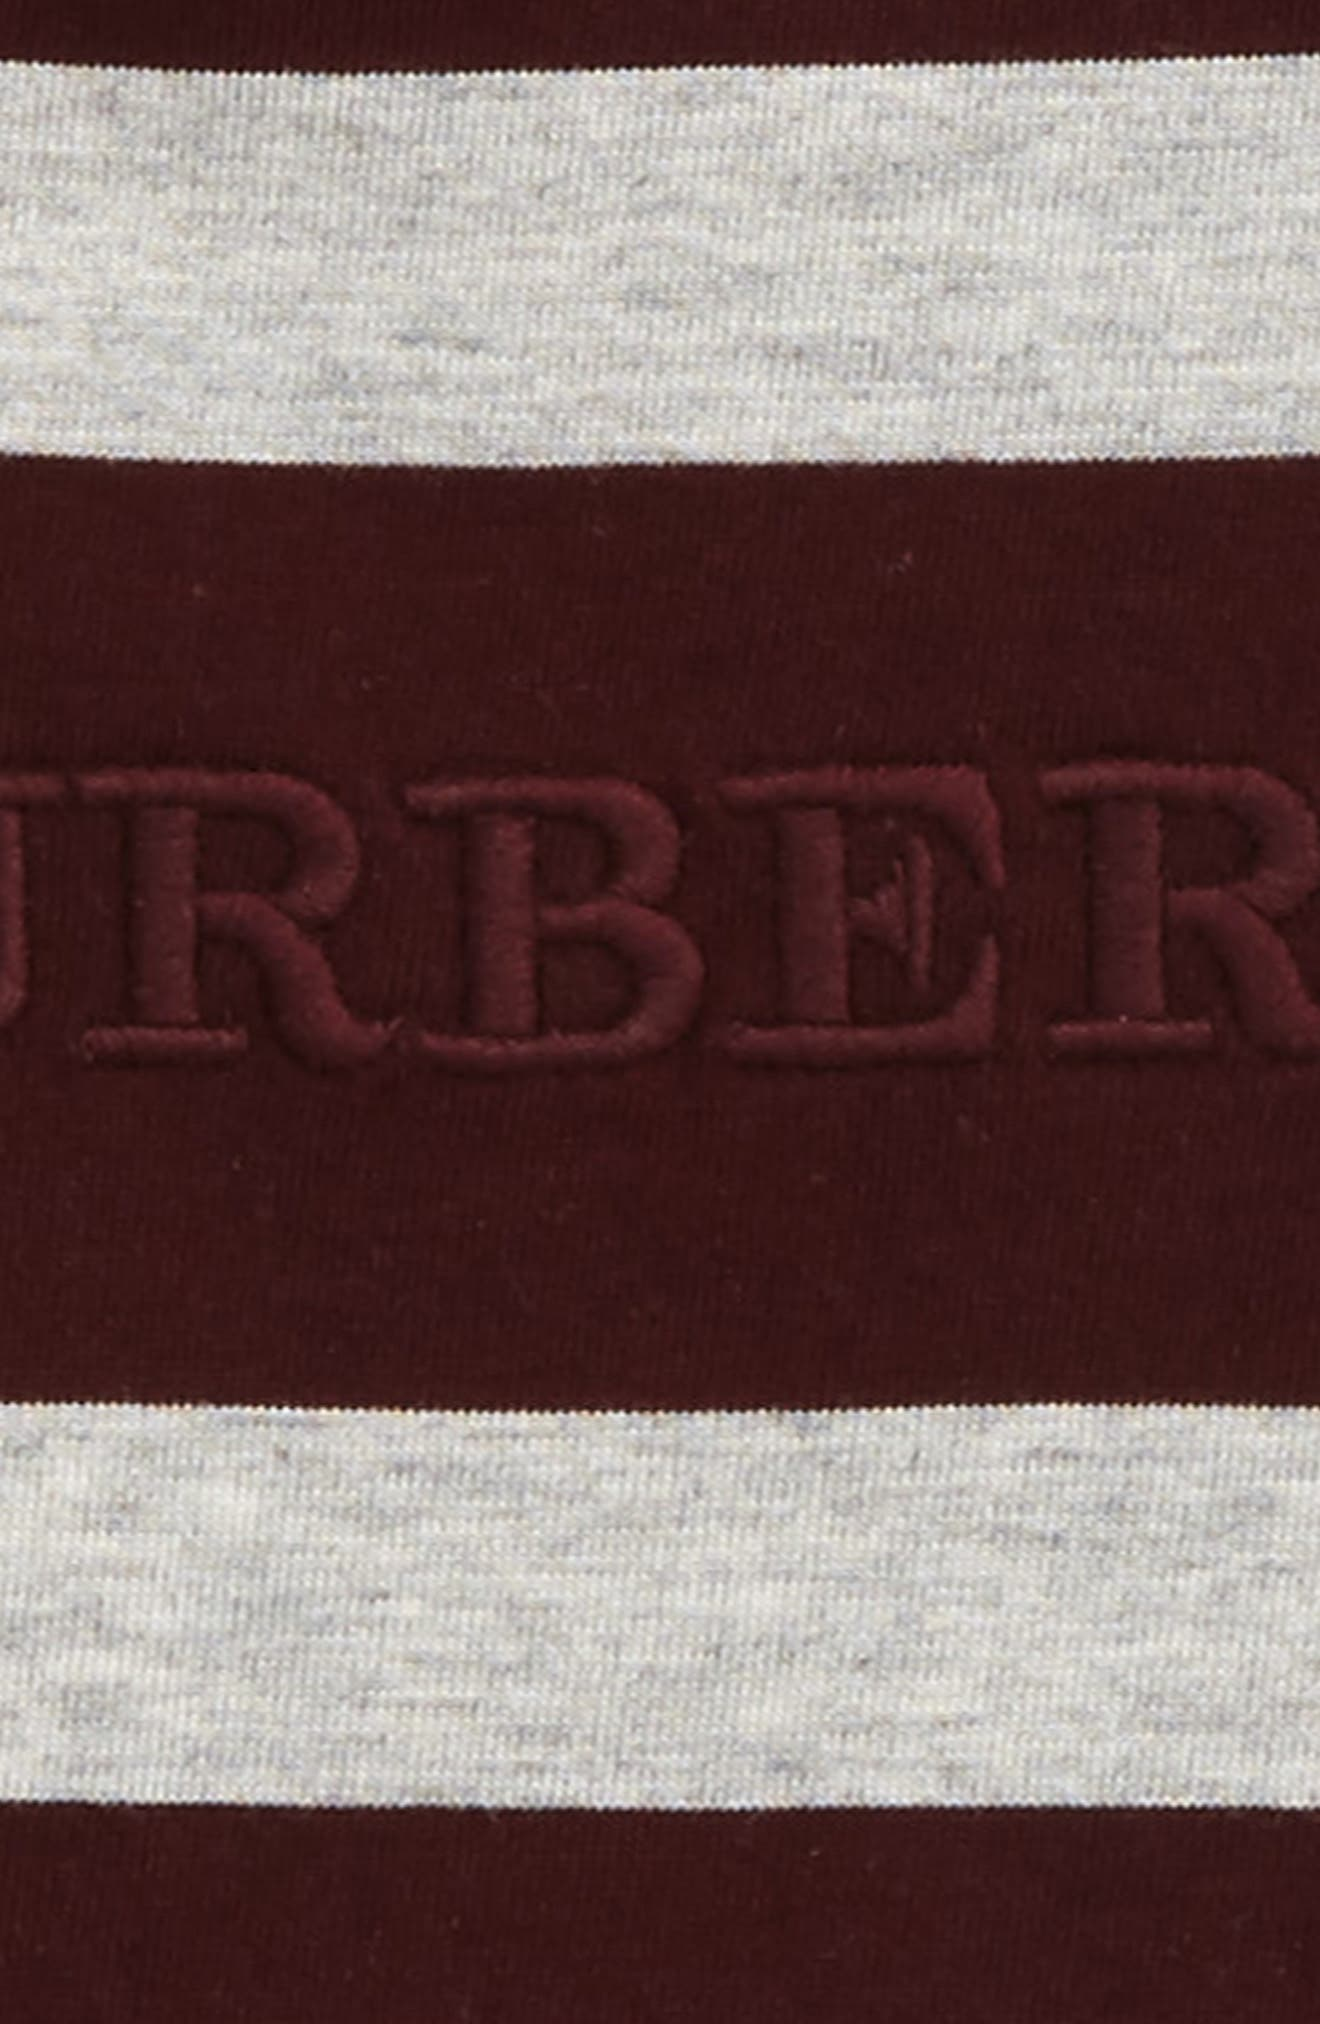 Mathew Stripe T-Shirt,                             Alternate thumbnail 2, color,                             930